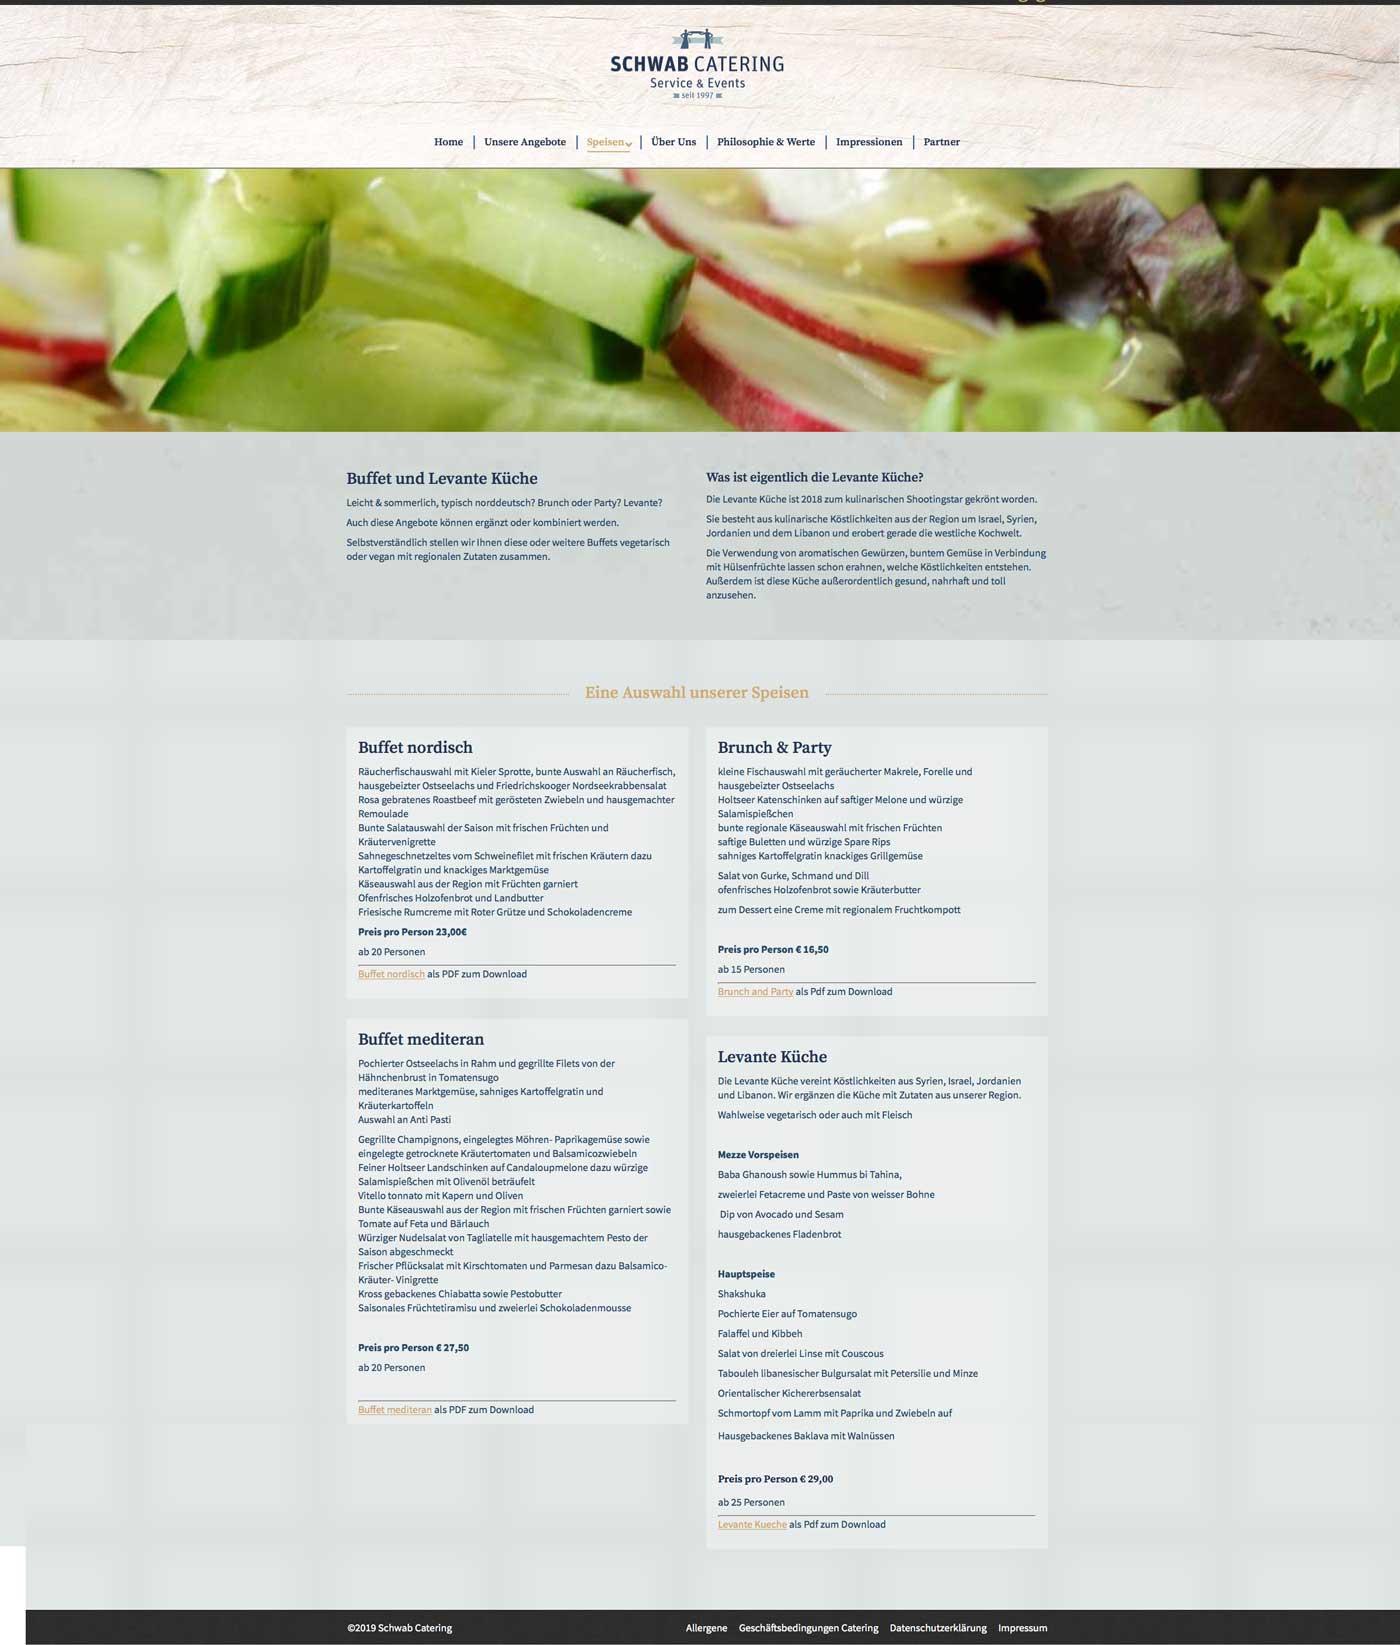 Schwab-Catering-Website-Speisen-Levante